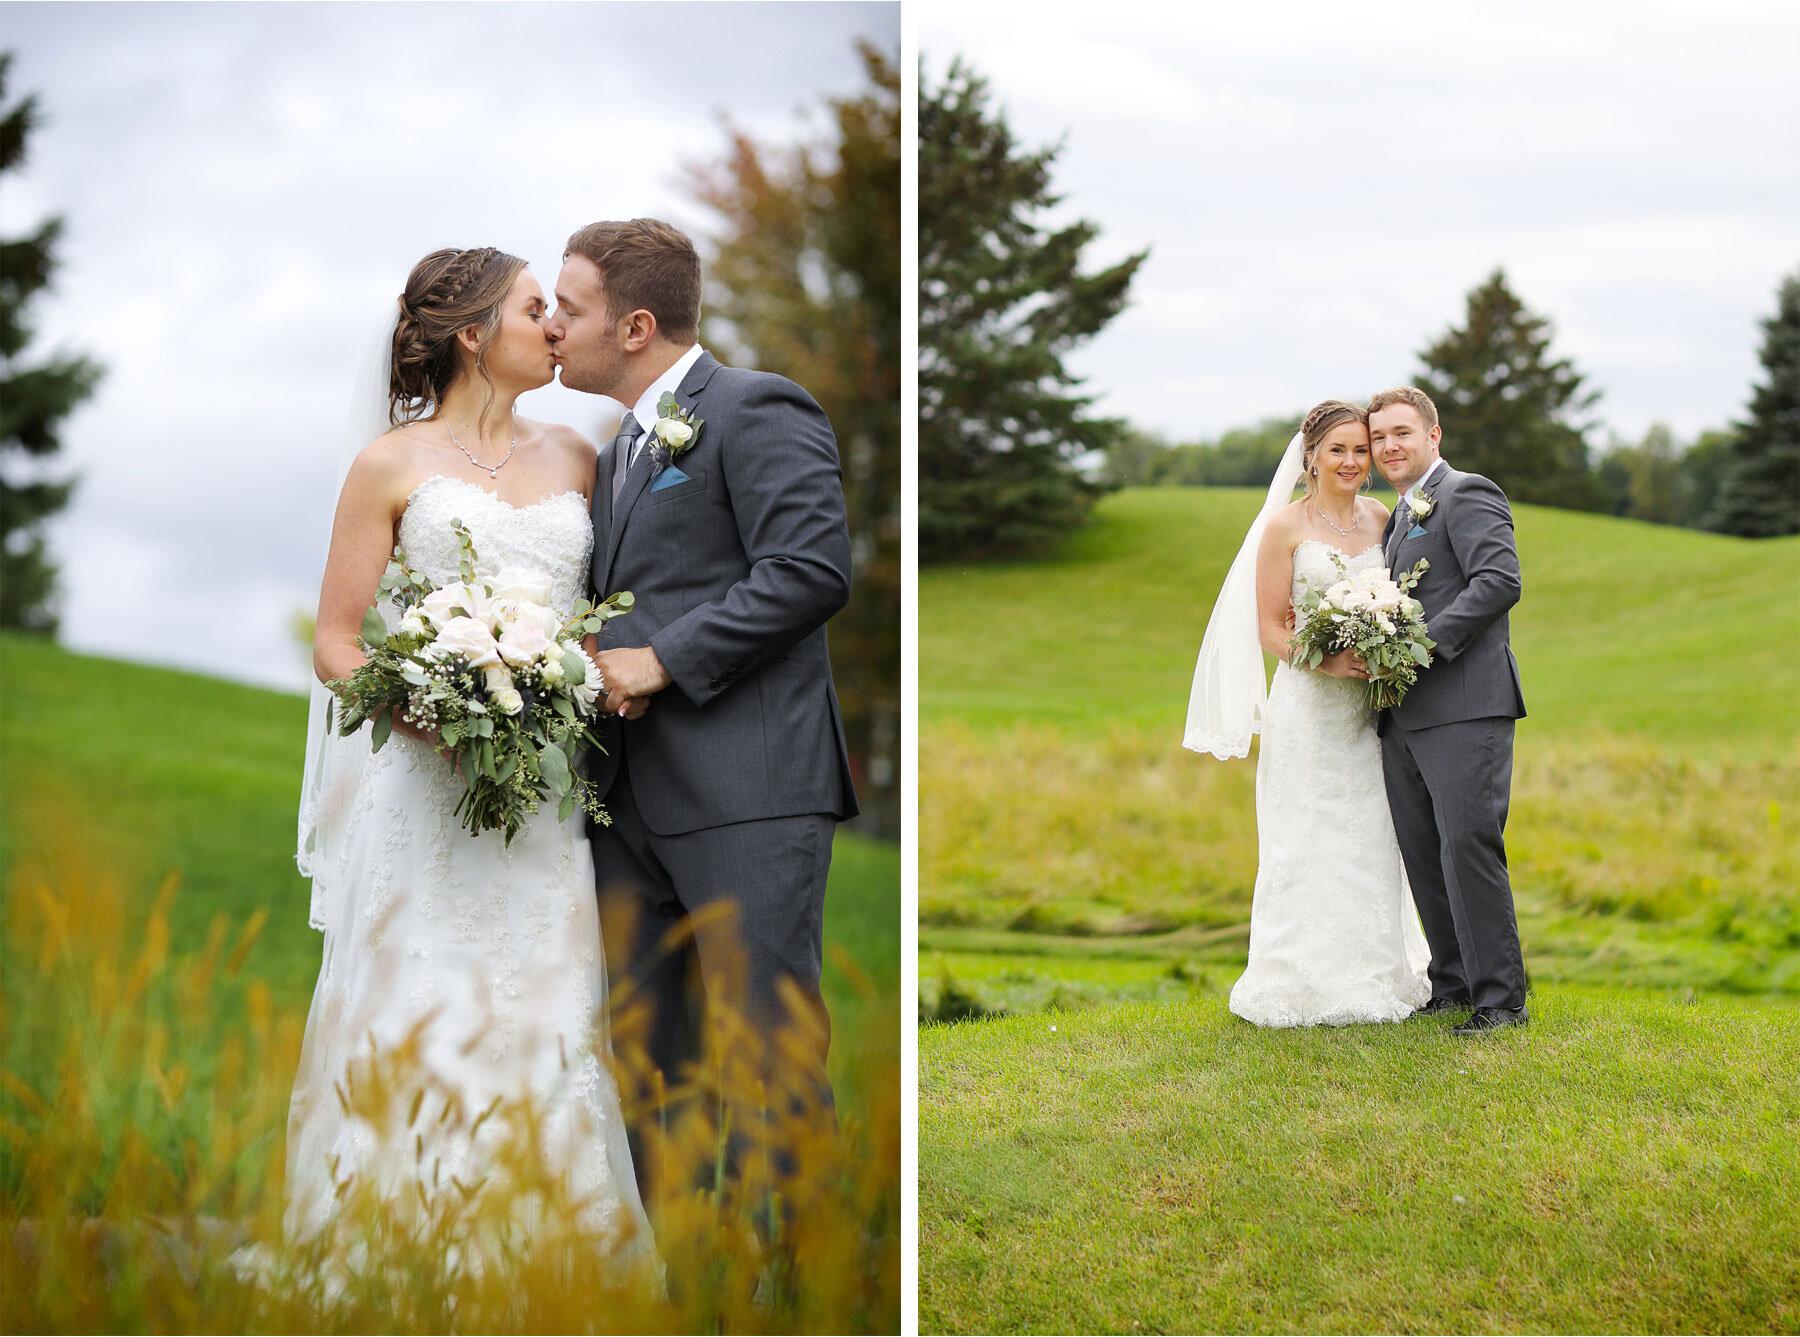 14-Vick-Photography-Minneapolis-Minnesota-Wedding-Rush-Creek-Golf-Club-Groom-Amanda-and-Michael.jpg